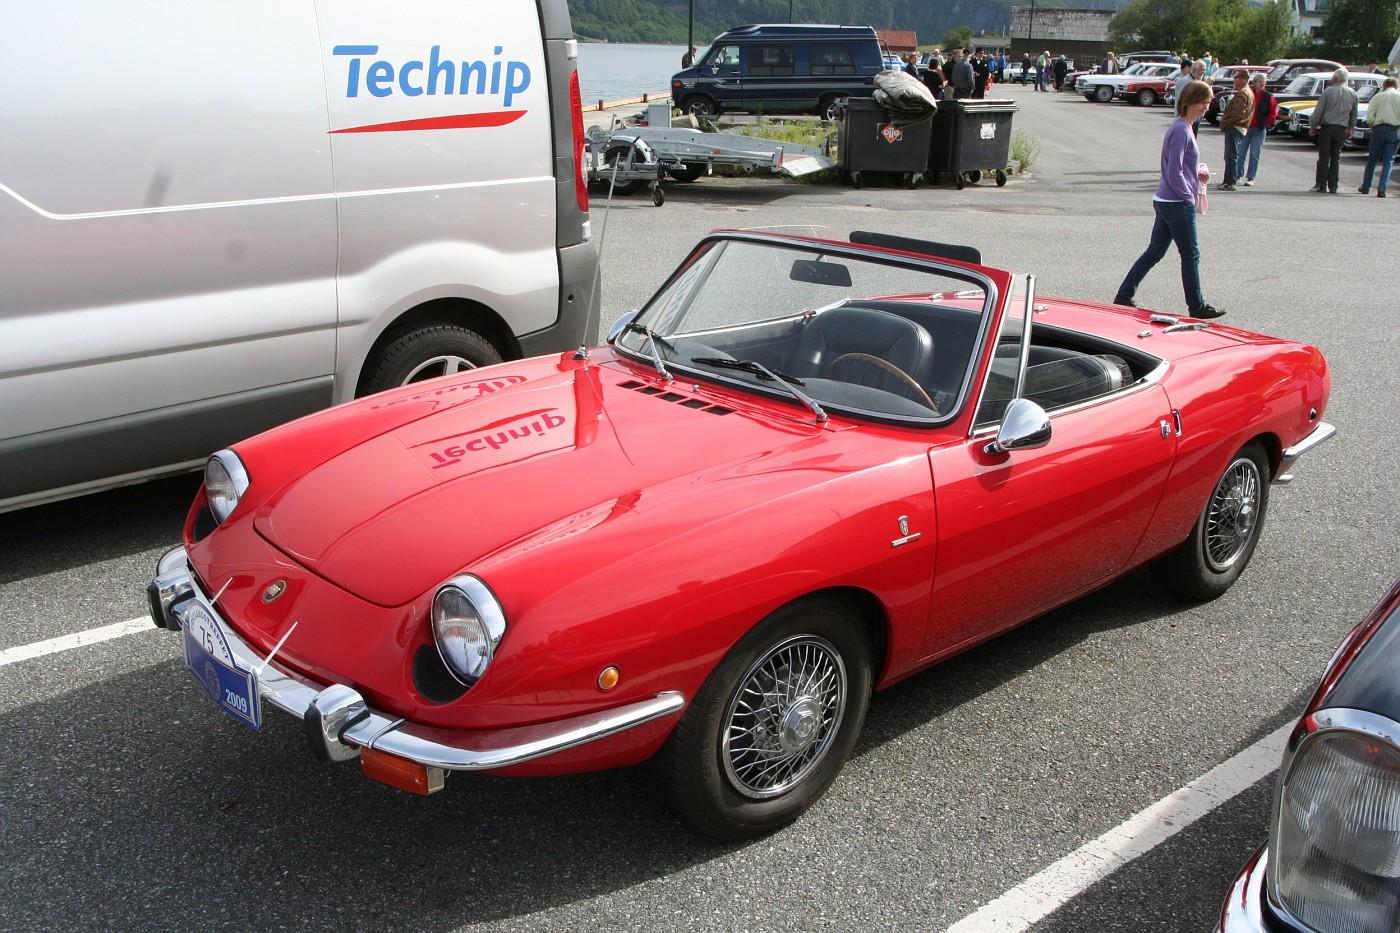 photo 1968 fiat 850 spider owner steinar myklebust img 9241 2009 08 01 veteran car show. Black Bedroom Furniture Sets. Home Design Ideas